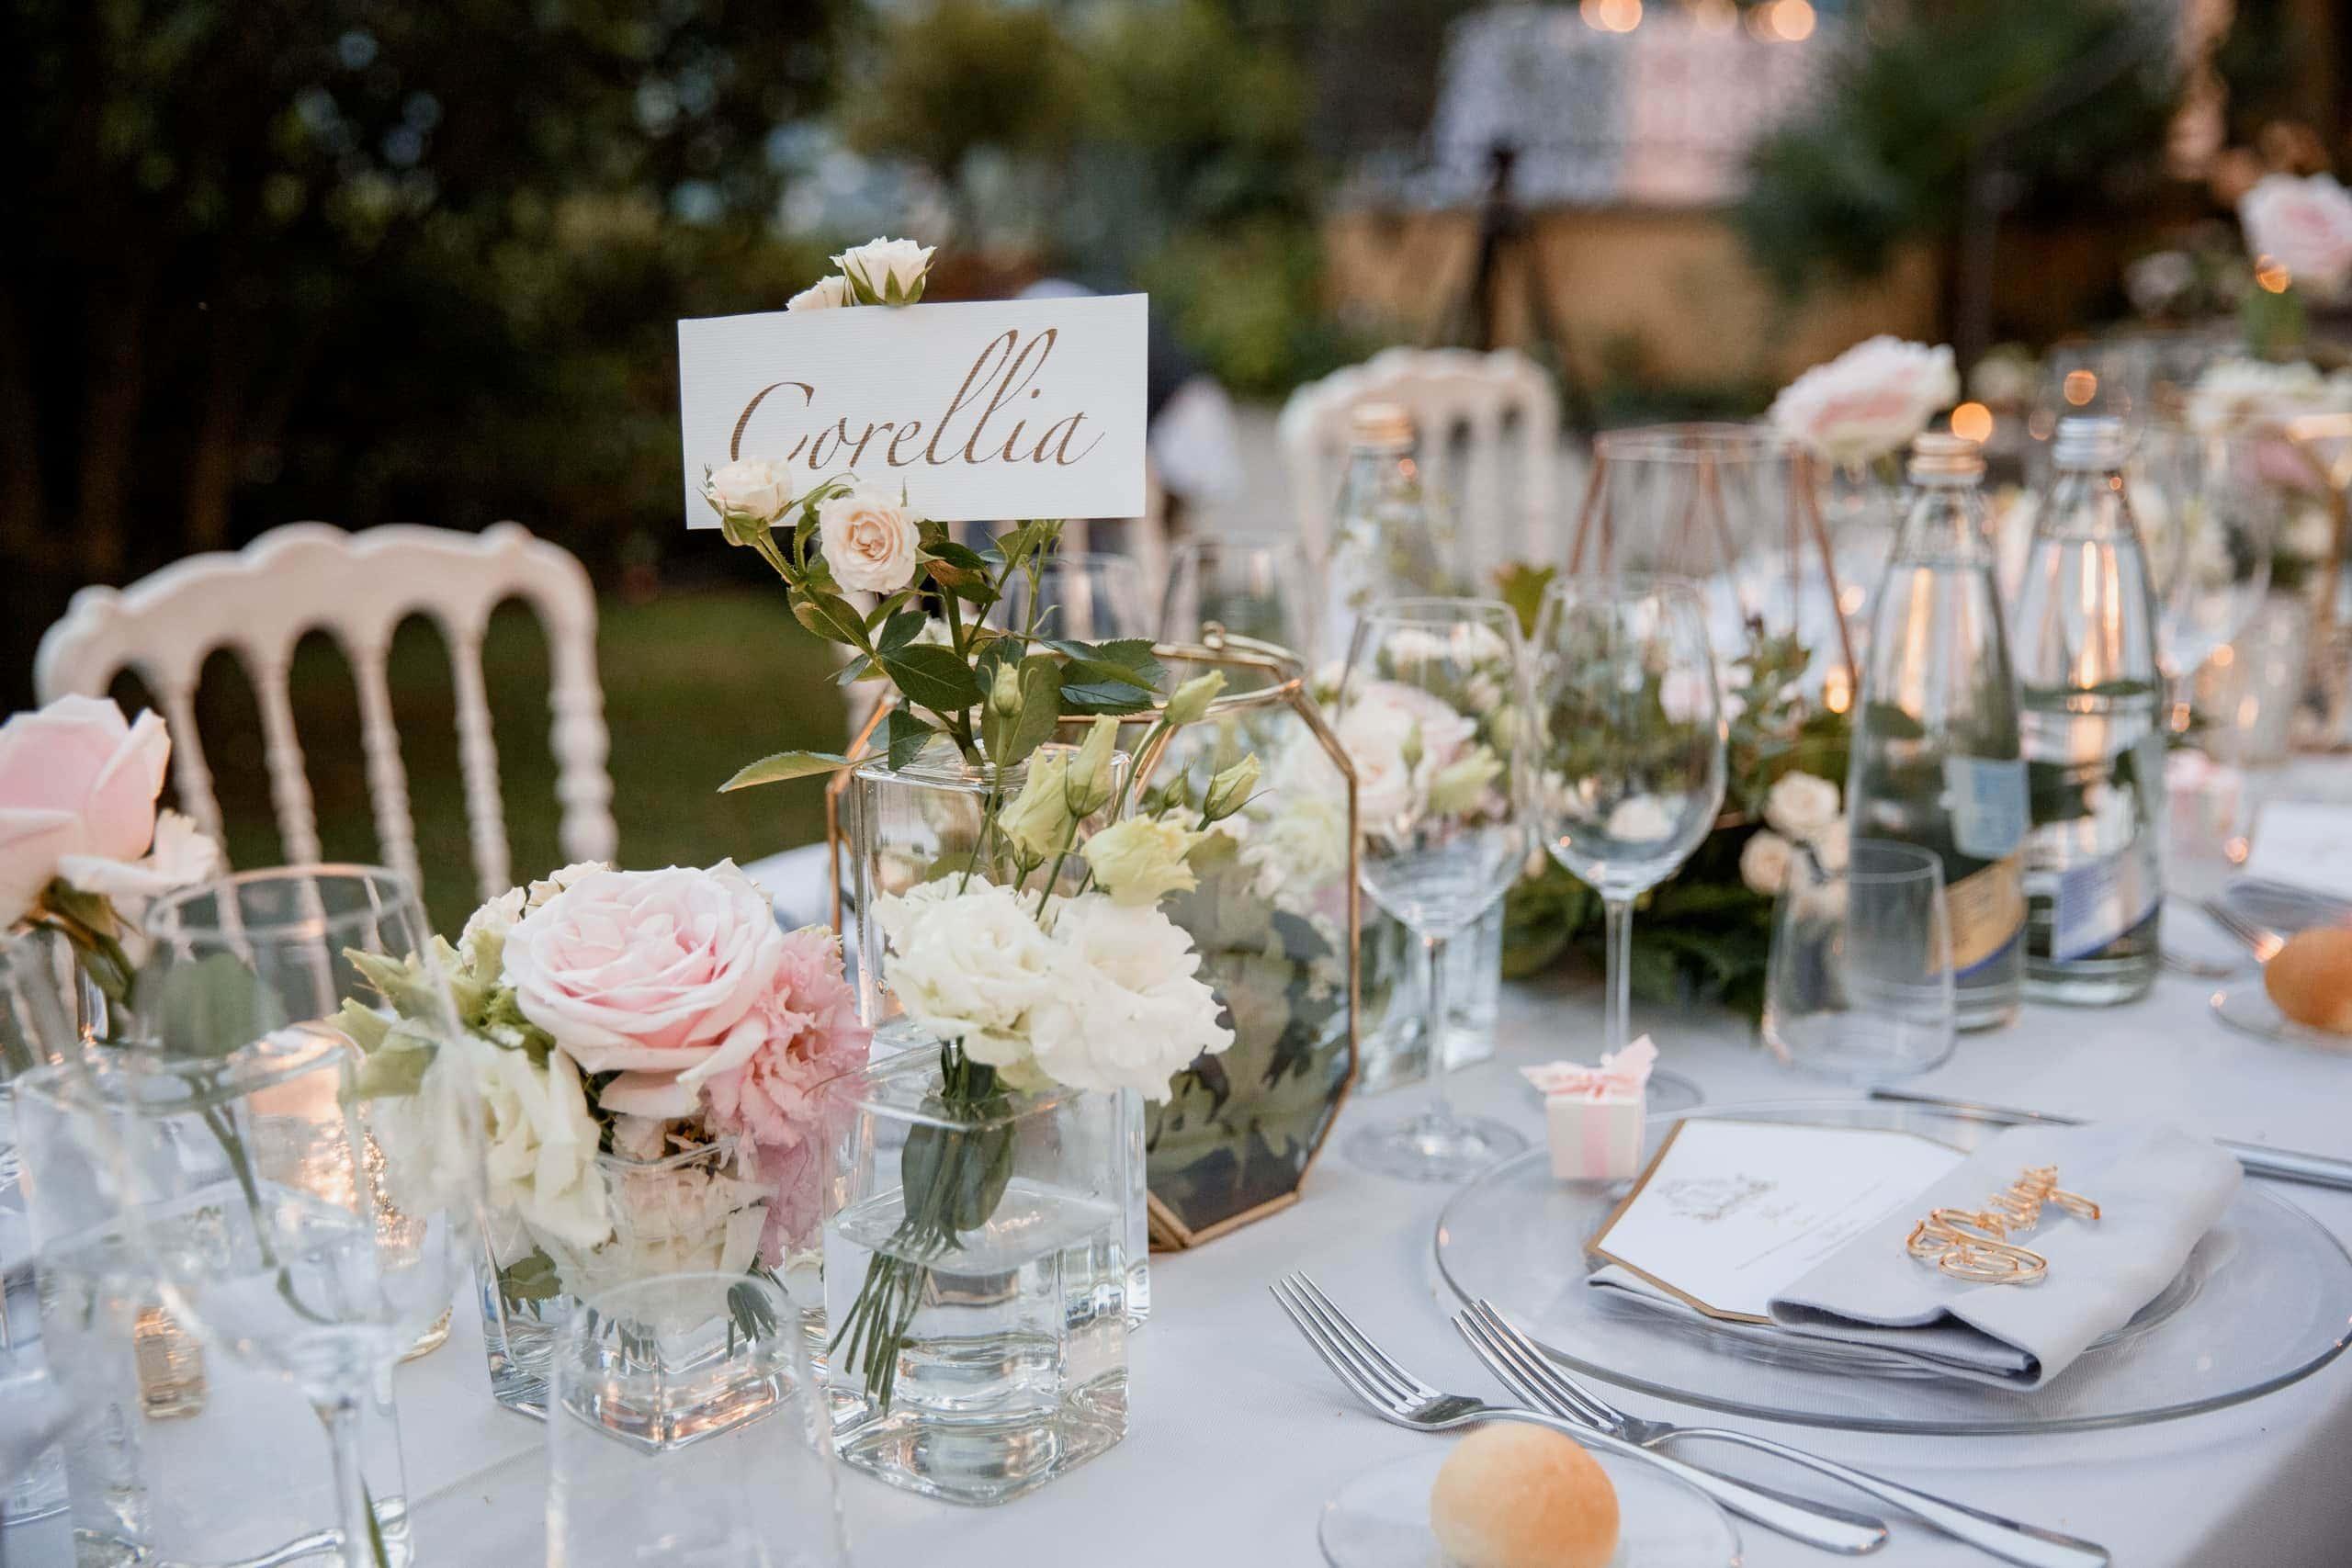 villa del balbianello wedding table